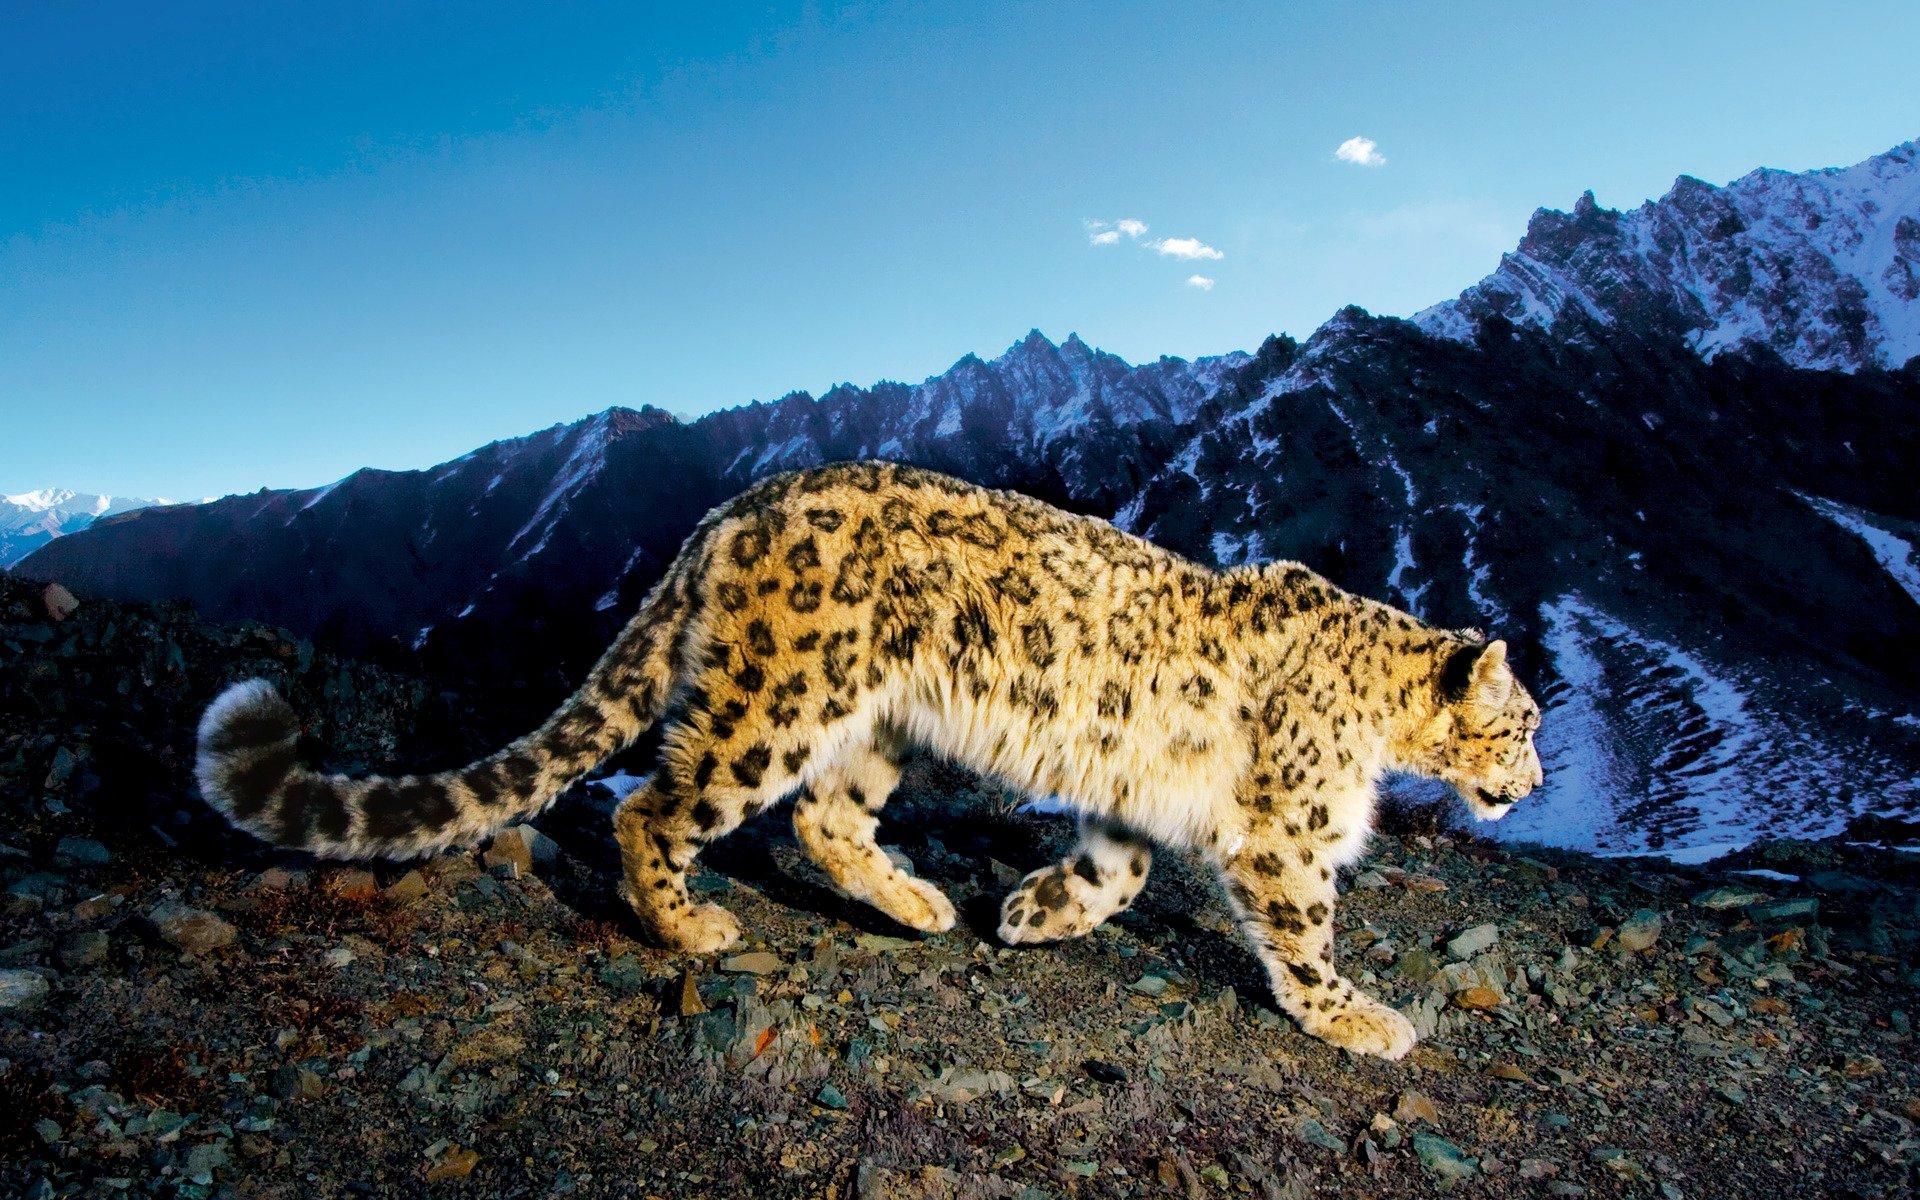 Amazing Wallpaper Mac Snow Leopard - Snow-Leopard-Wallpaper-006  Gallery_28180.jpg